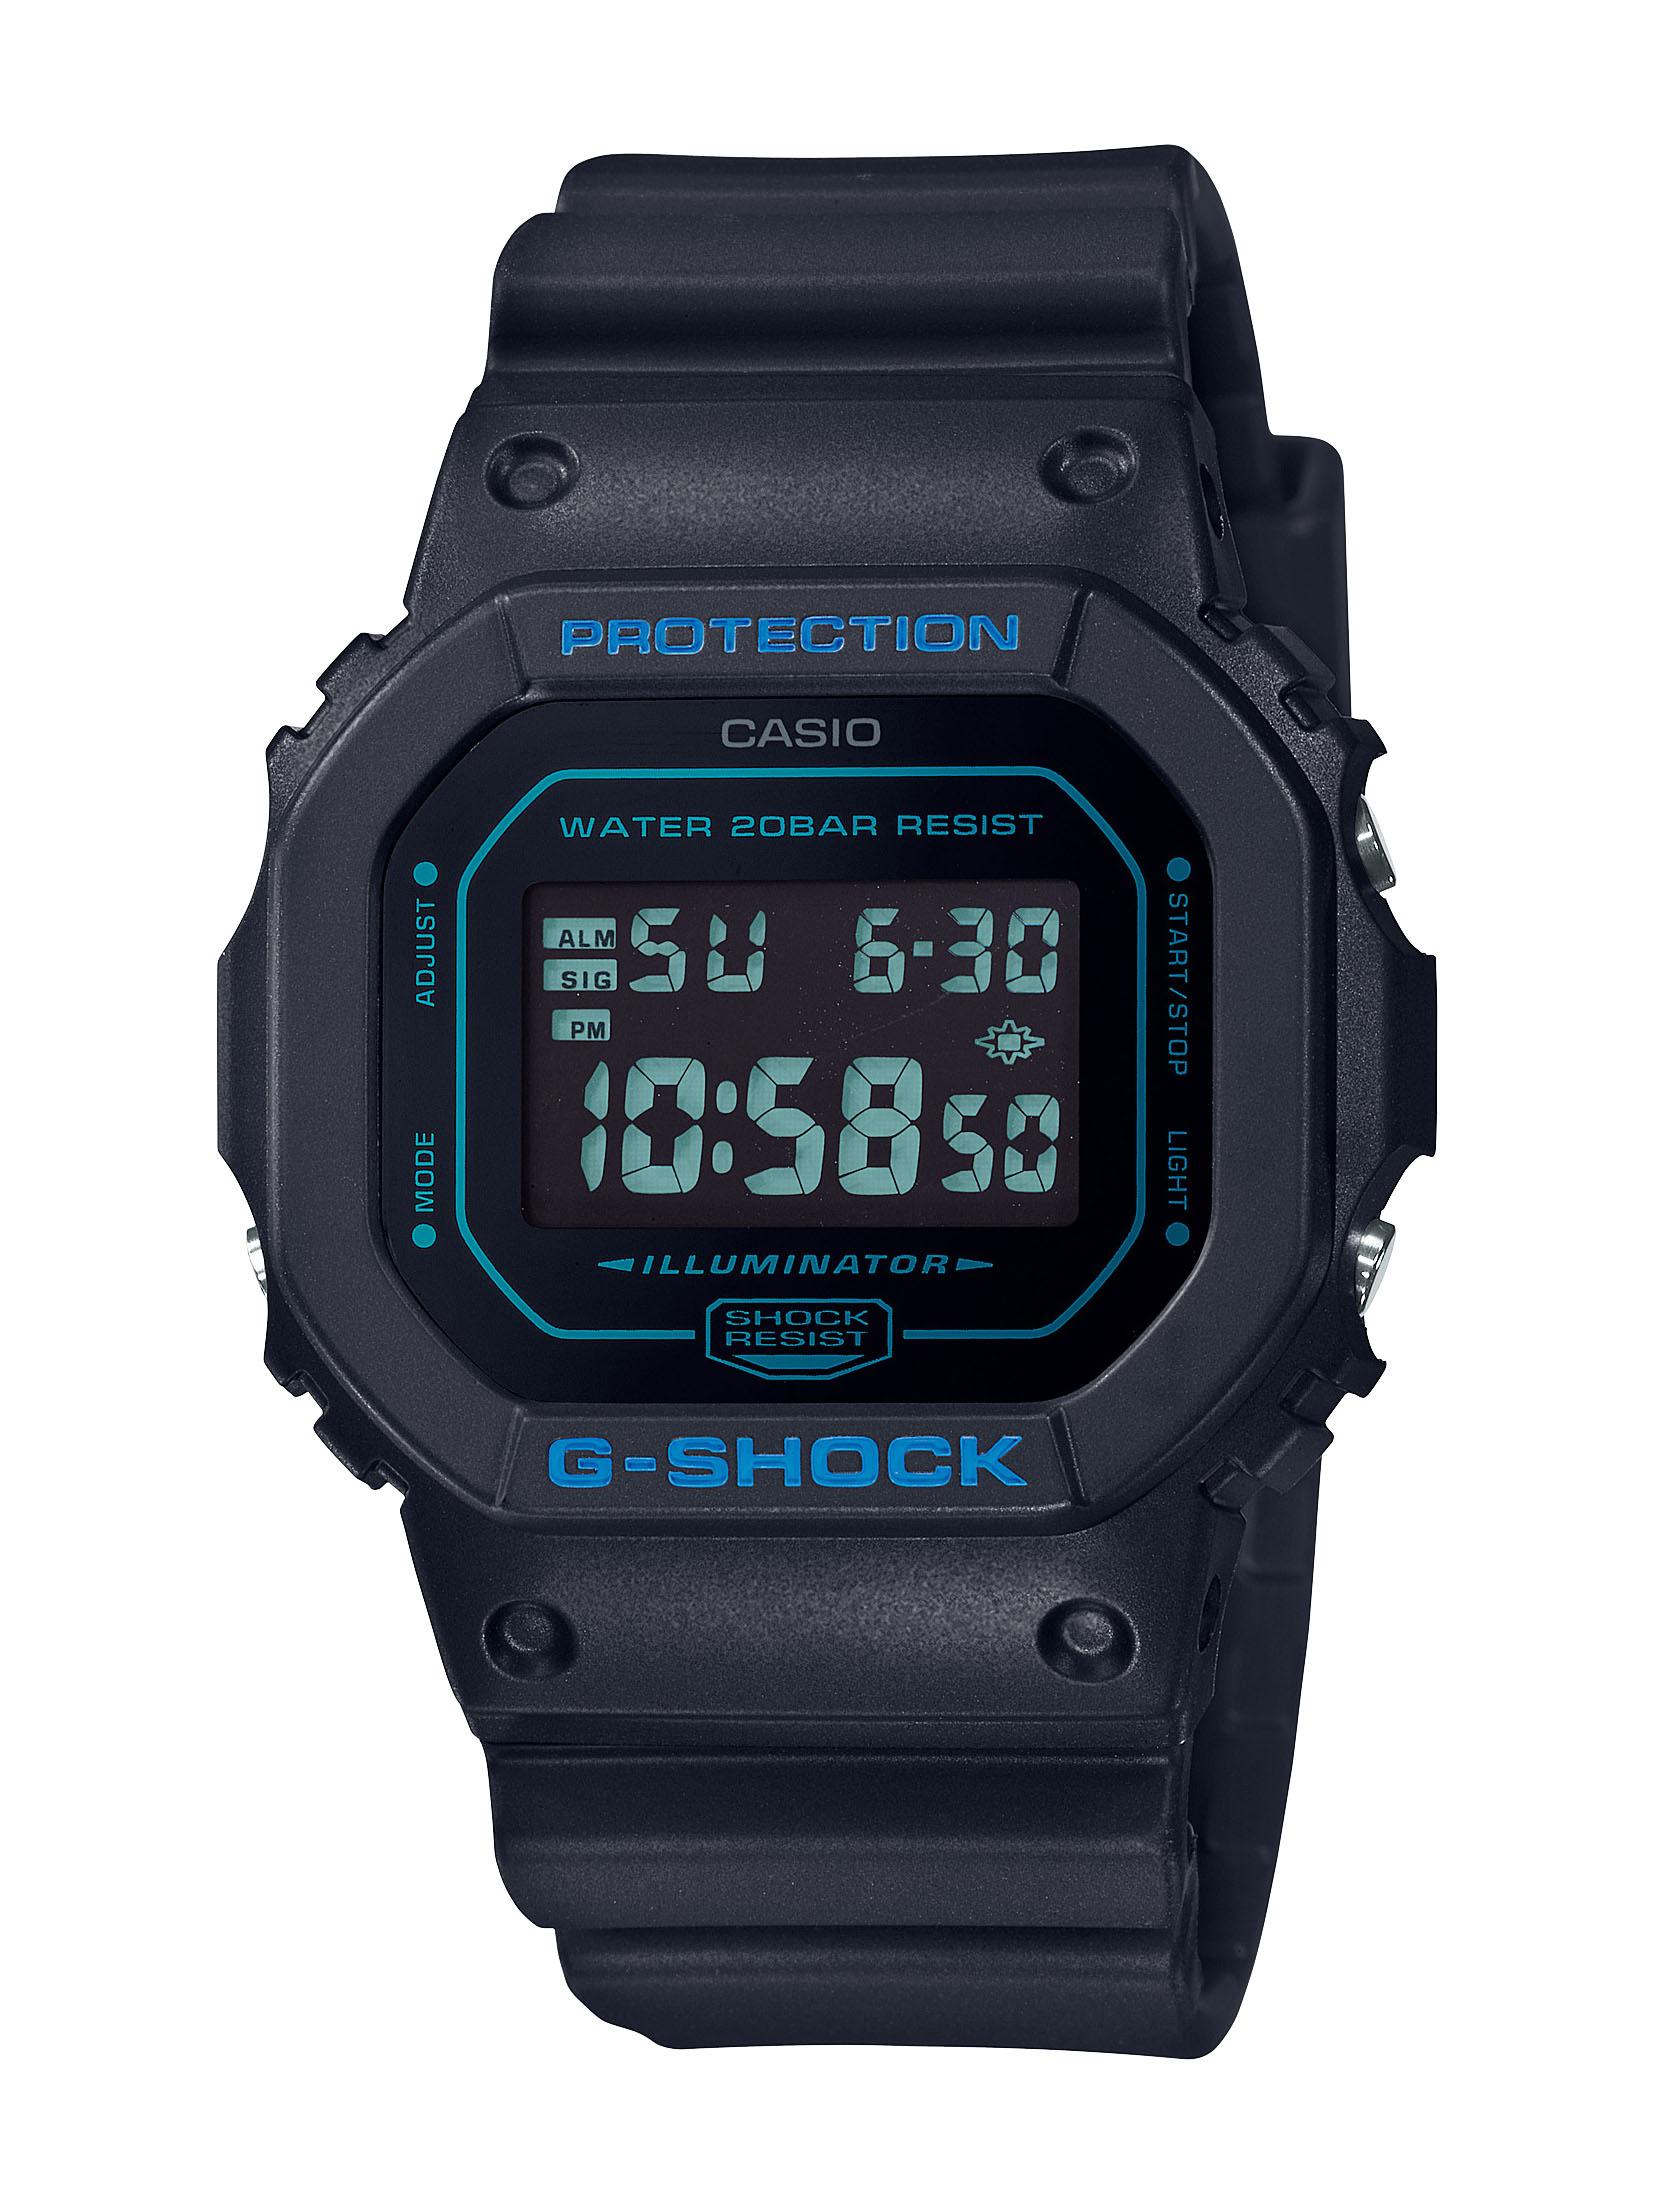 Casio G-Shock DW-5600BBM-1DR Black Resin Mens Watch